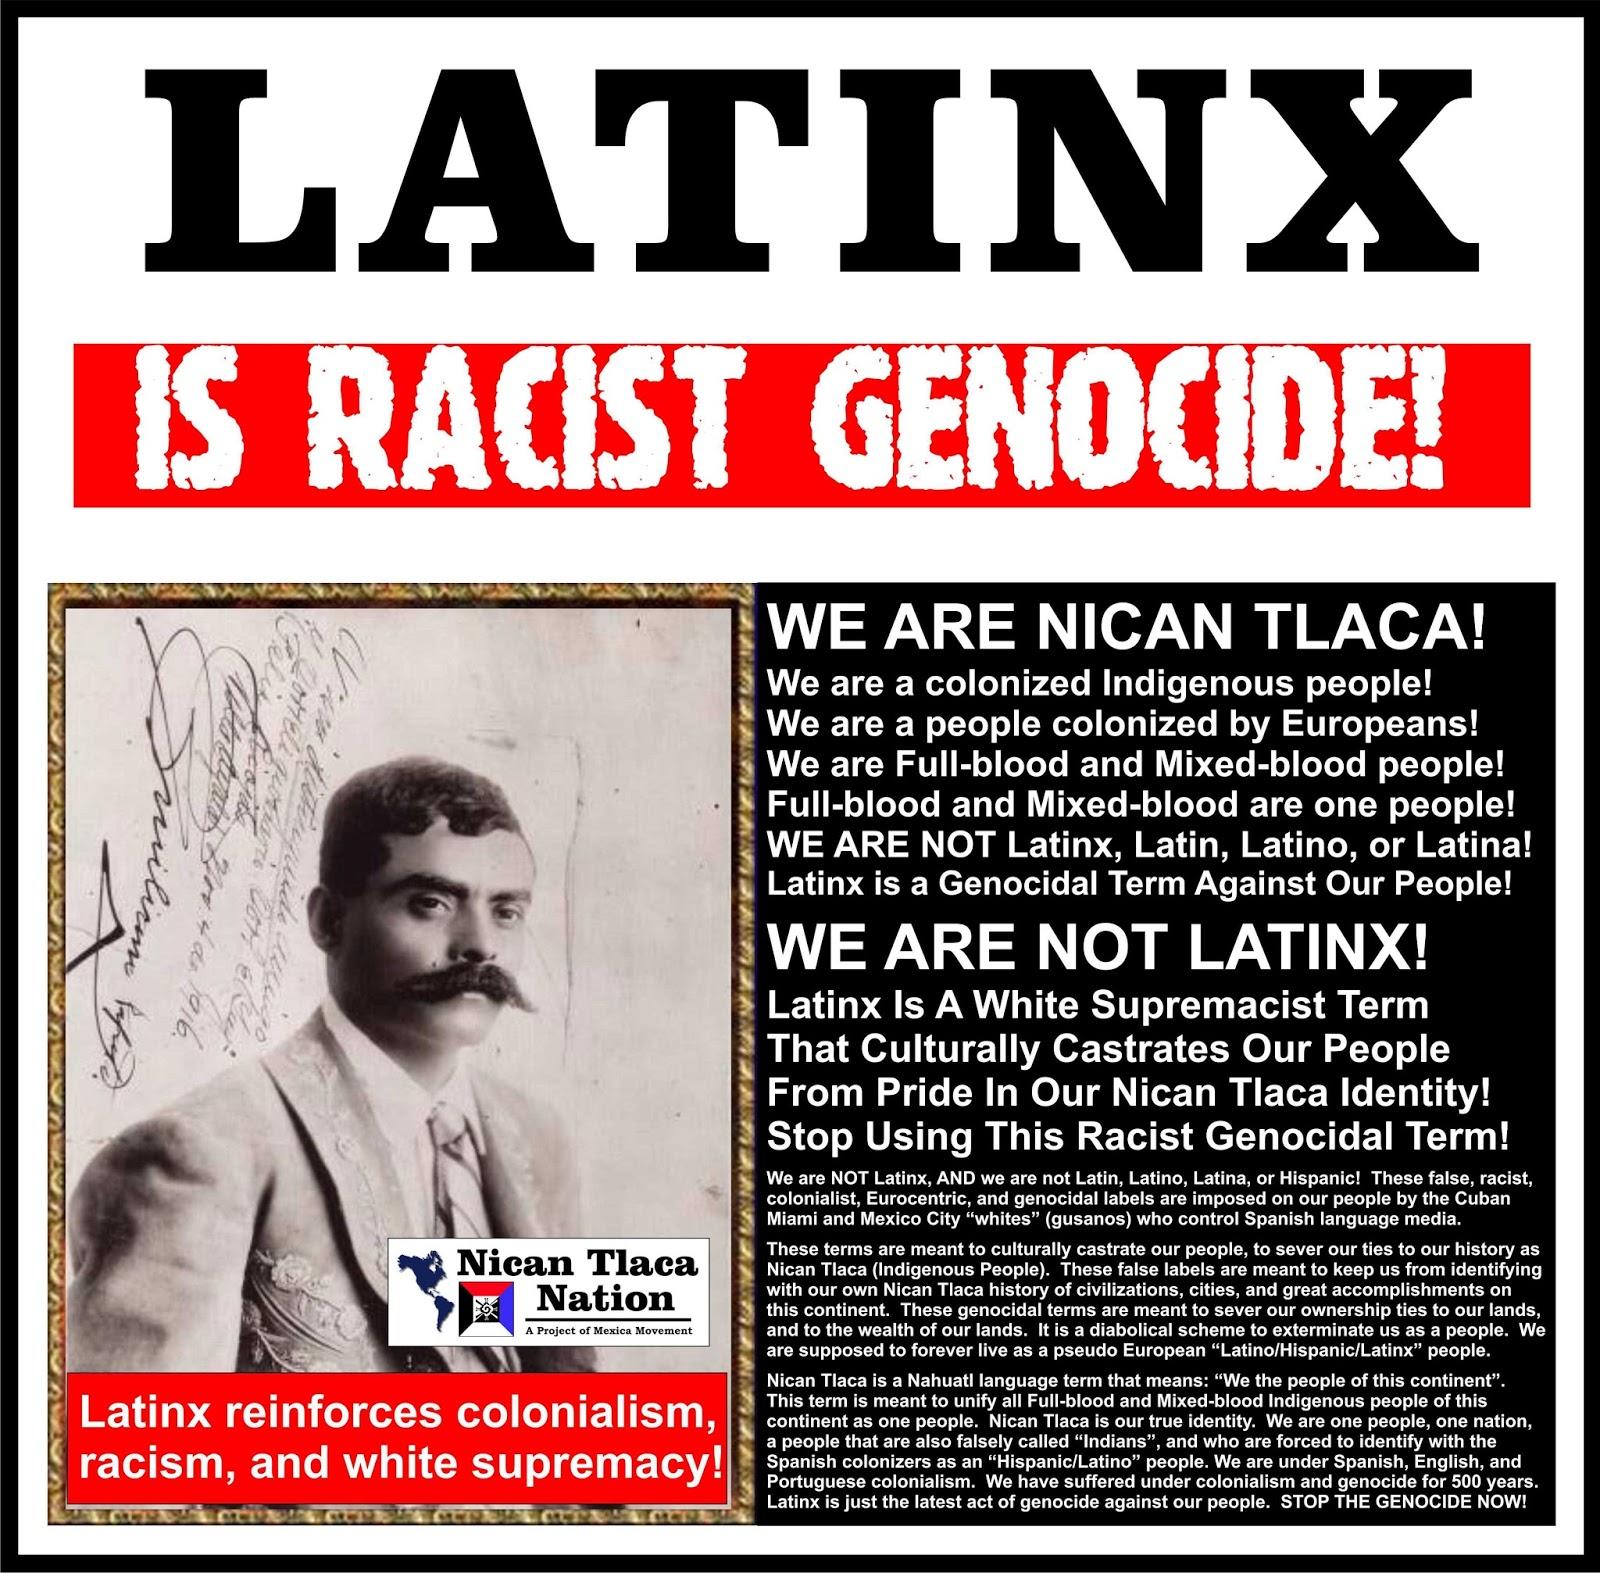 Spaniard racism against latins